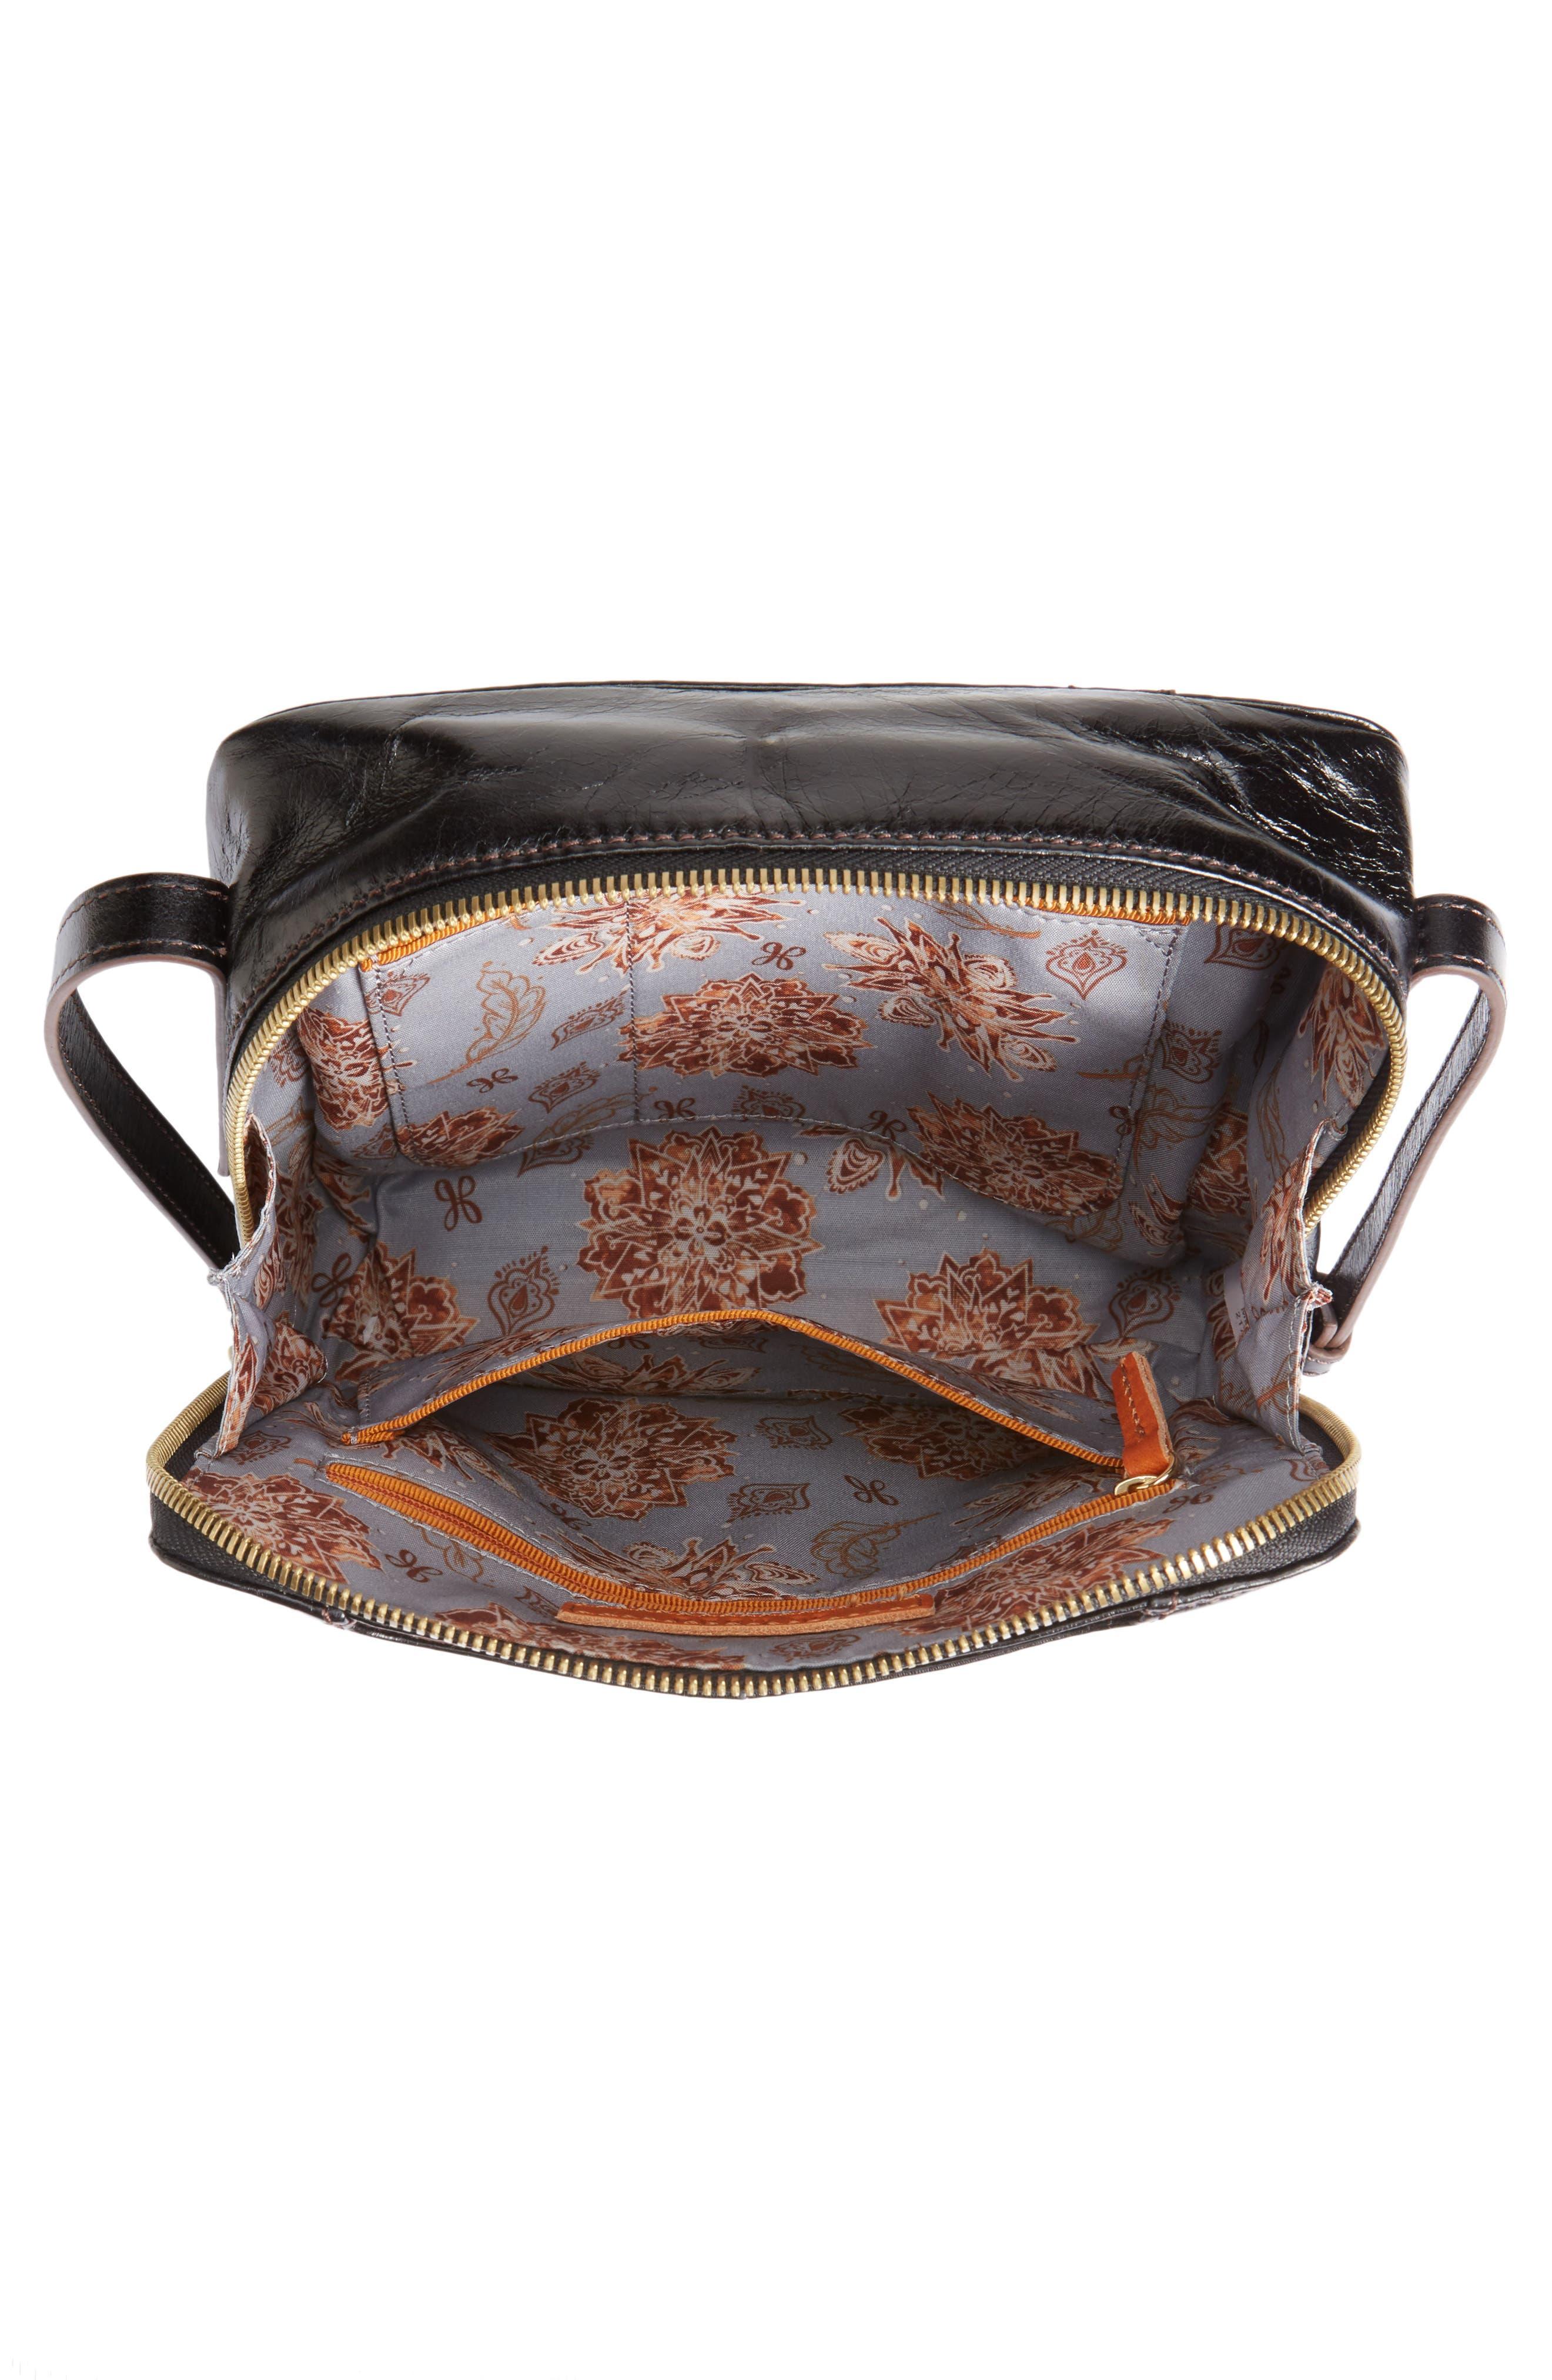 Lyric Leather Crossbody Bag,                             Alternate thumbnail 4, color,                             001